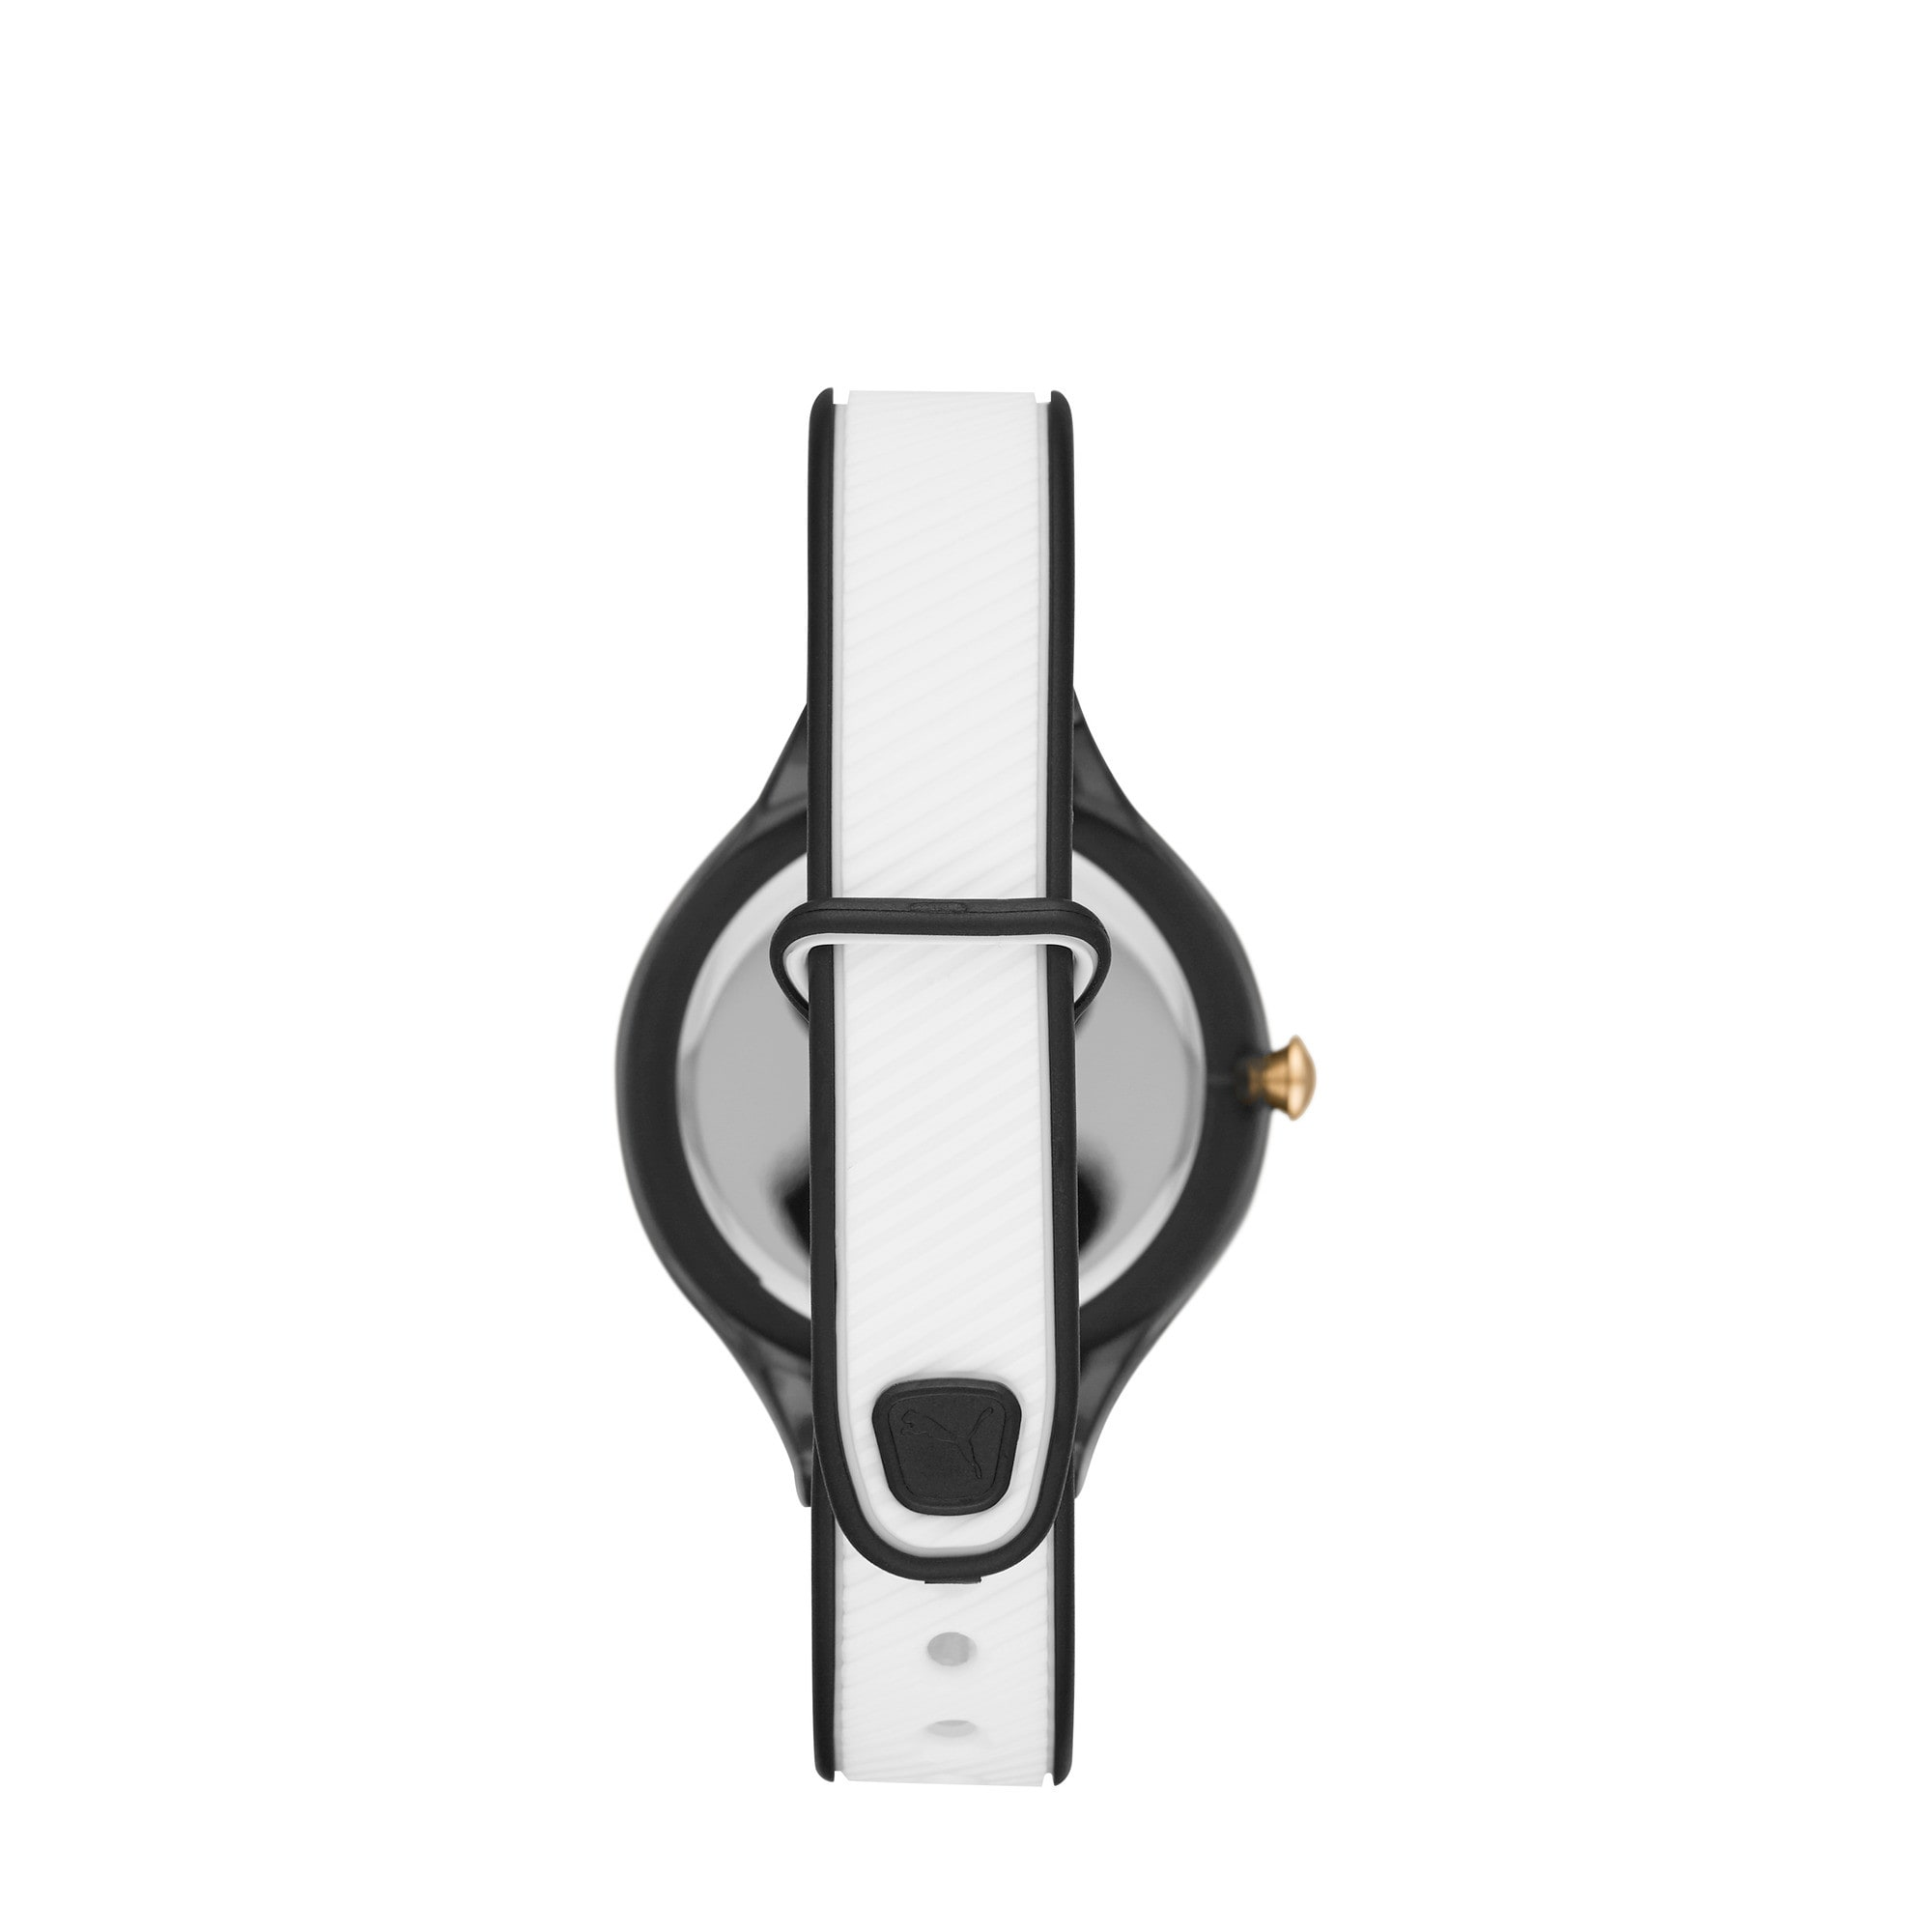 Thumbnail 2 of CONTOUR Ultra Slim Women's Watch, Black/White, medium